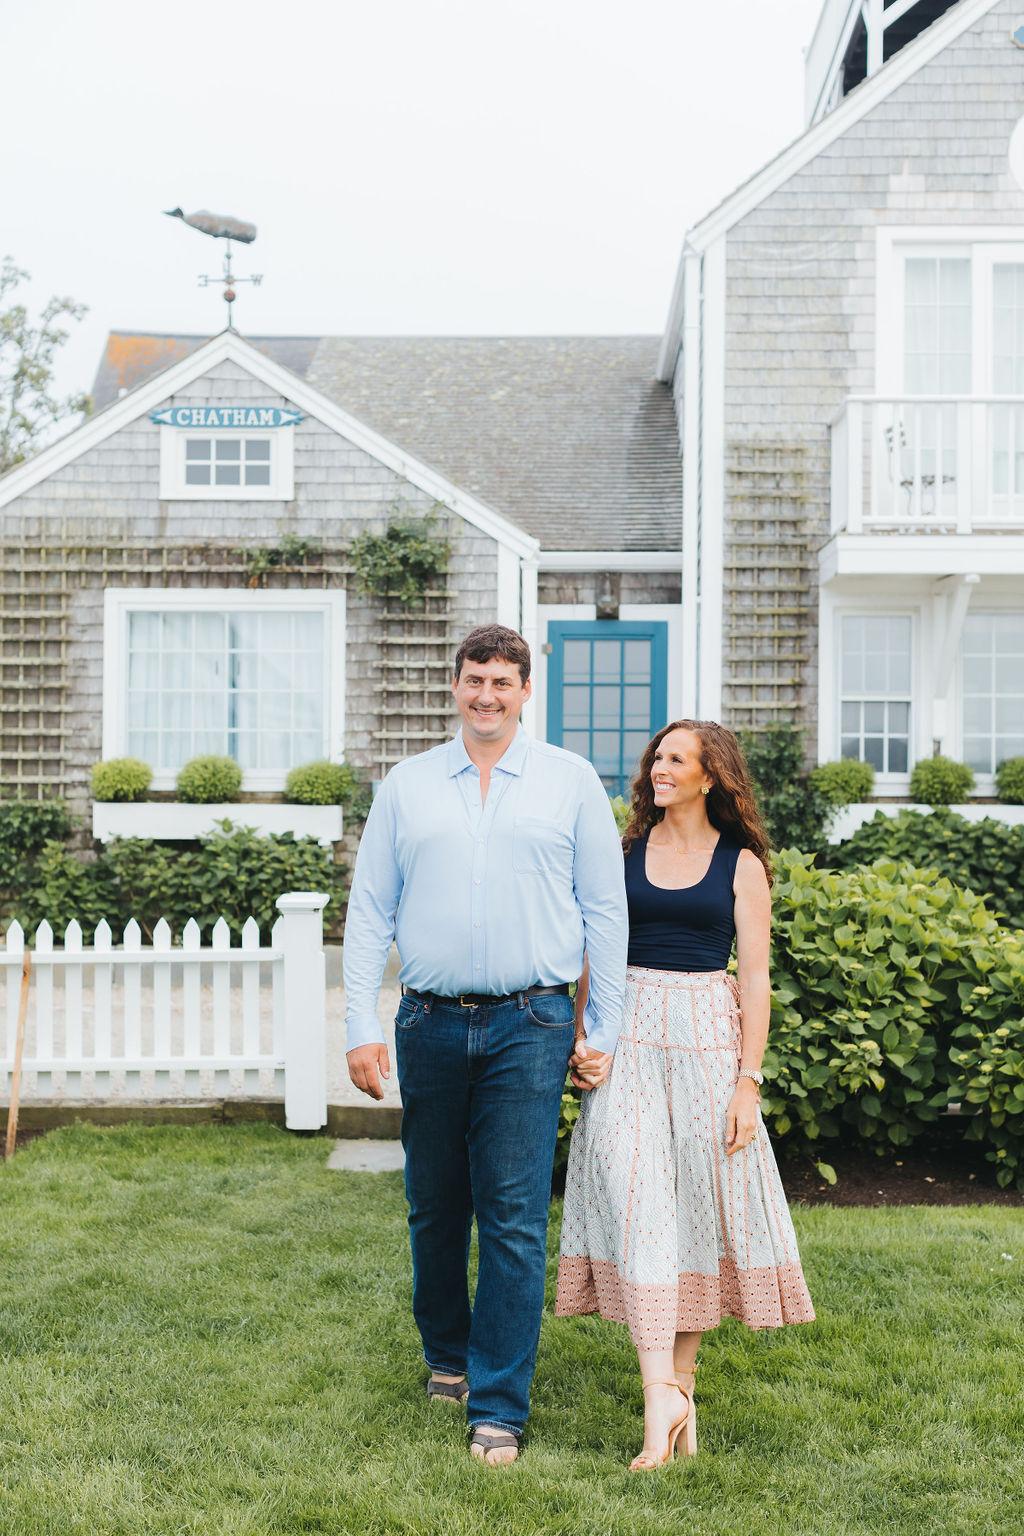 Amy Sanford Nantucket Real Estate